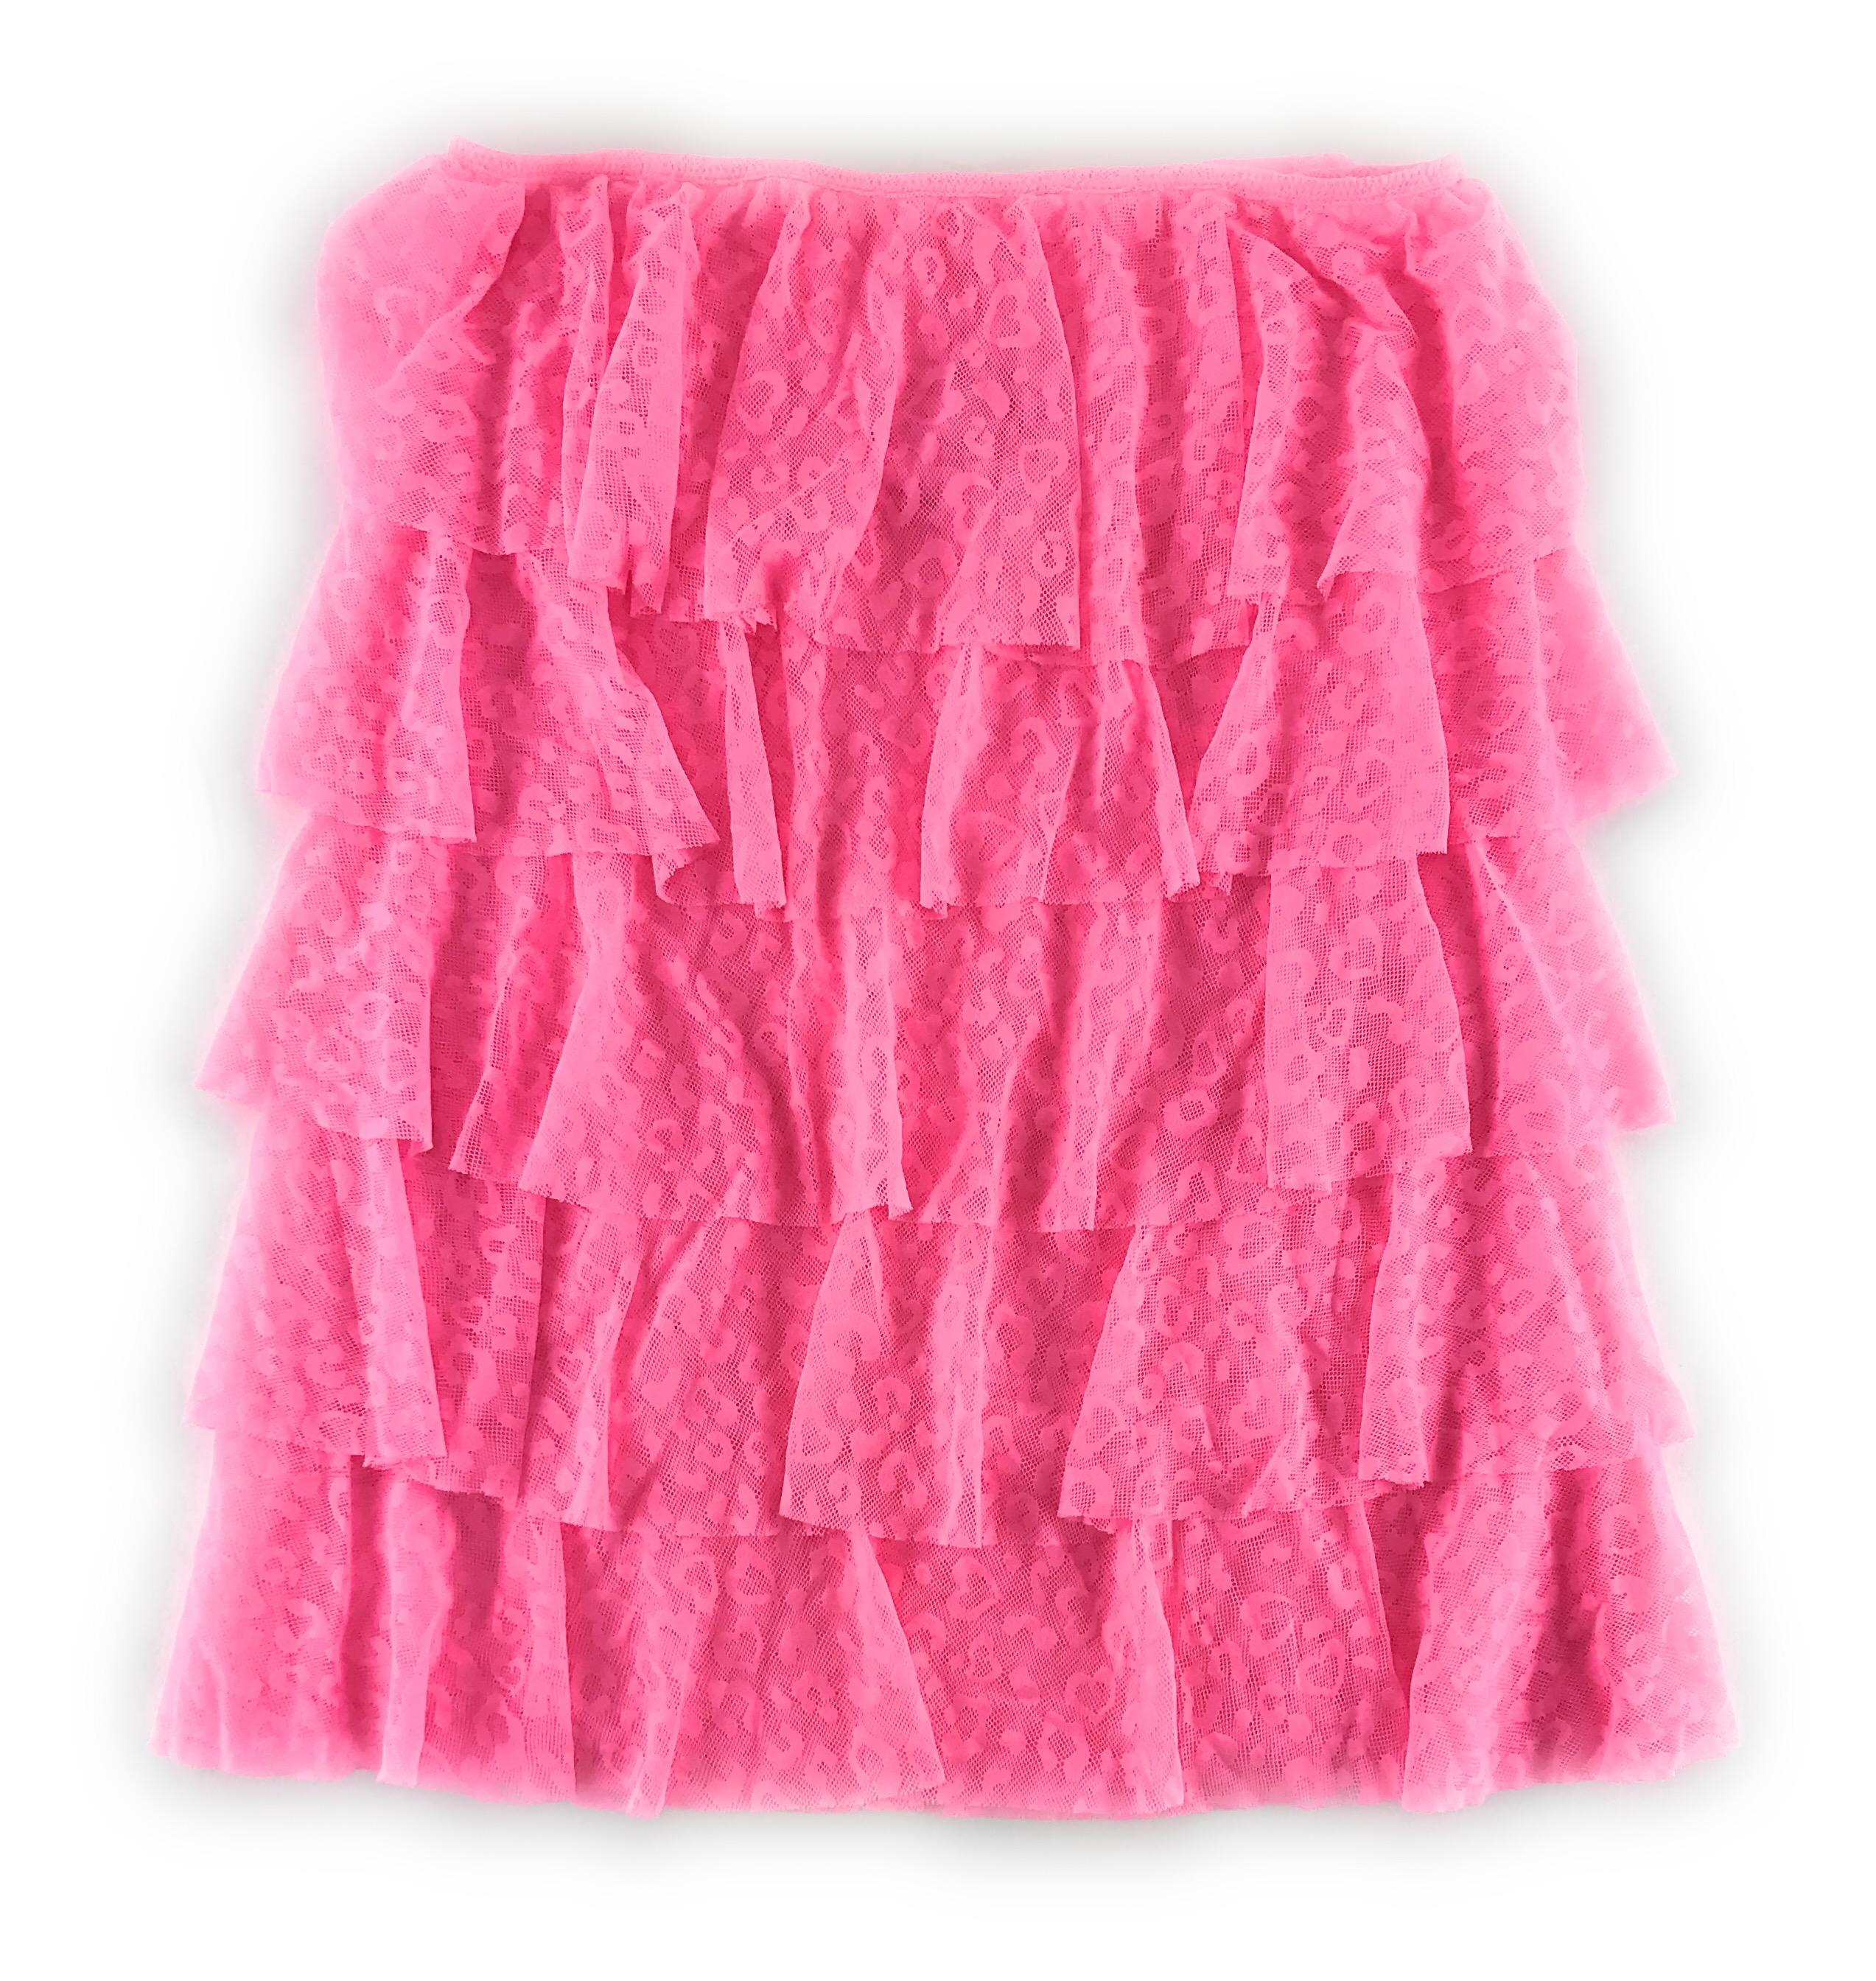 Victoria/'s Secret Swim Suit Cover Up Beach Dress Skirt Oversized Watercolor